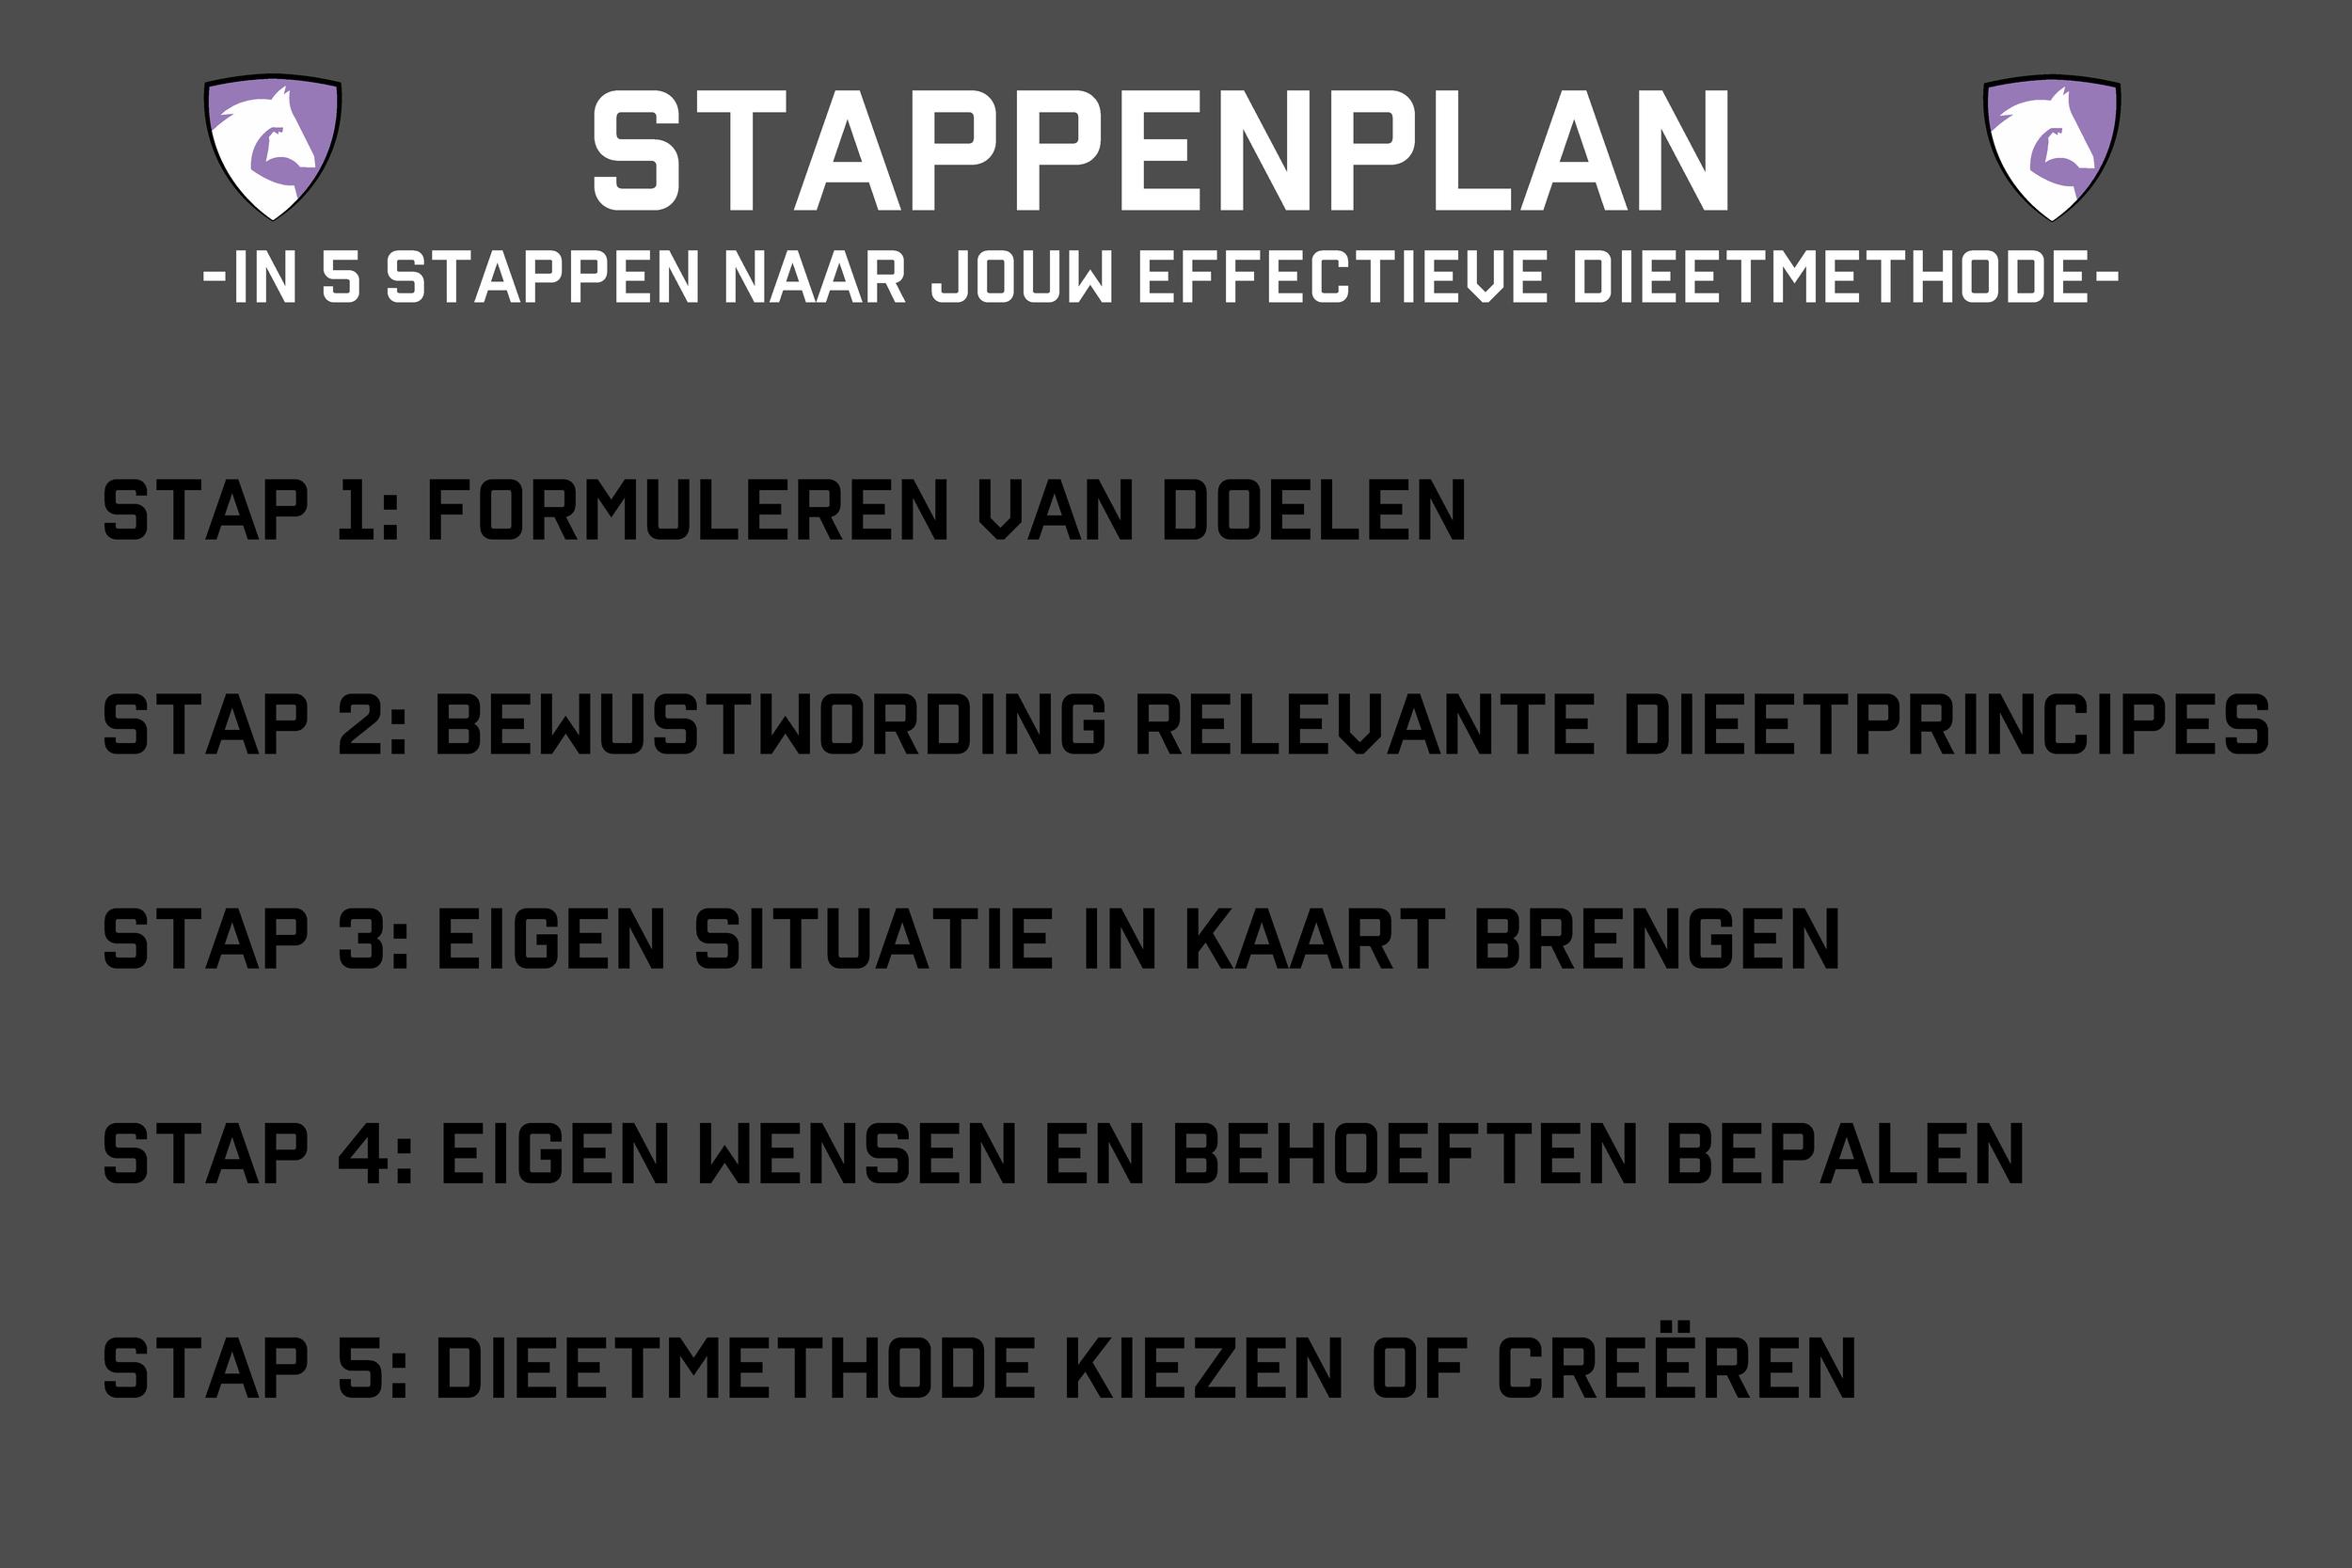 Stappenplan-effectieve-dieetmethode.png